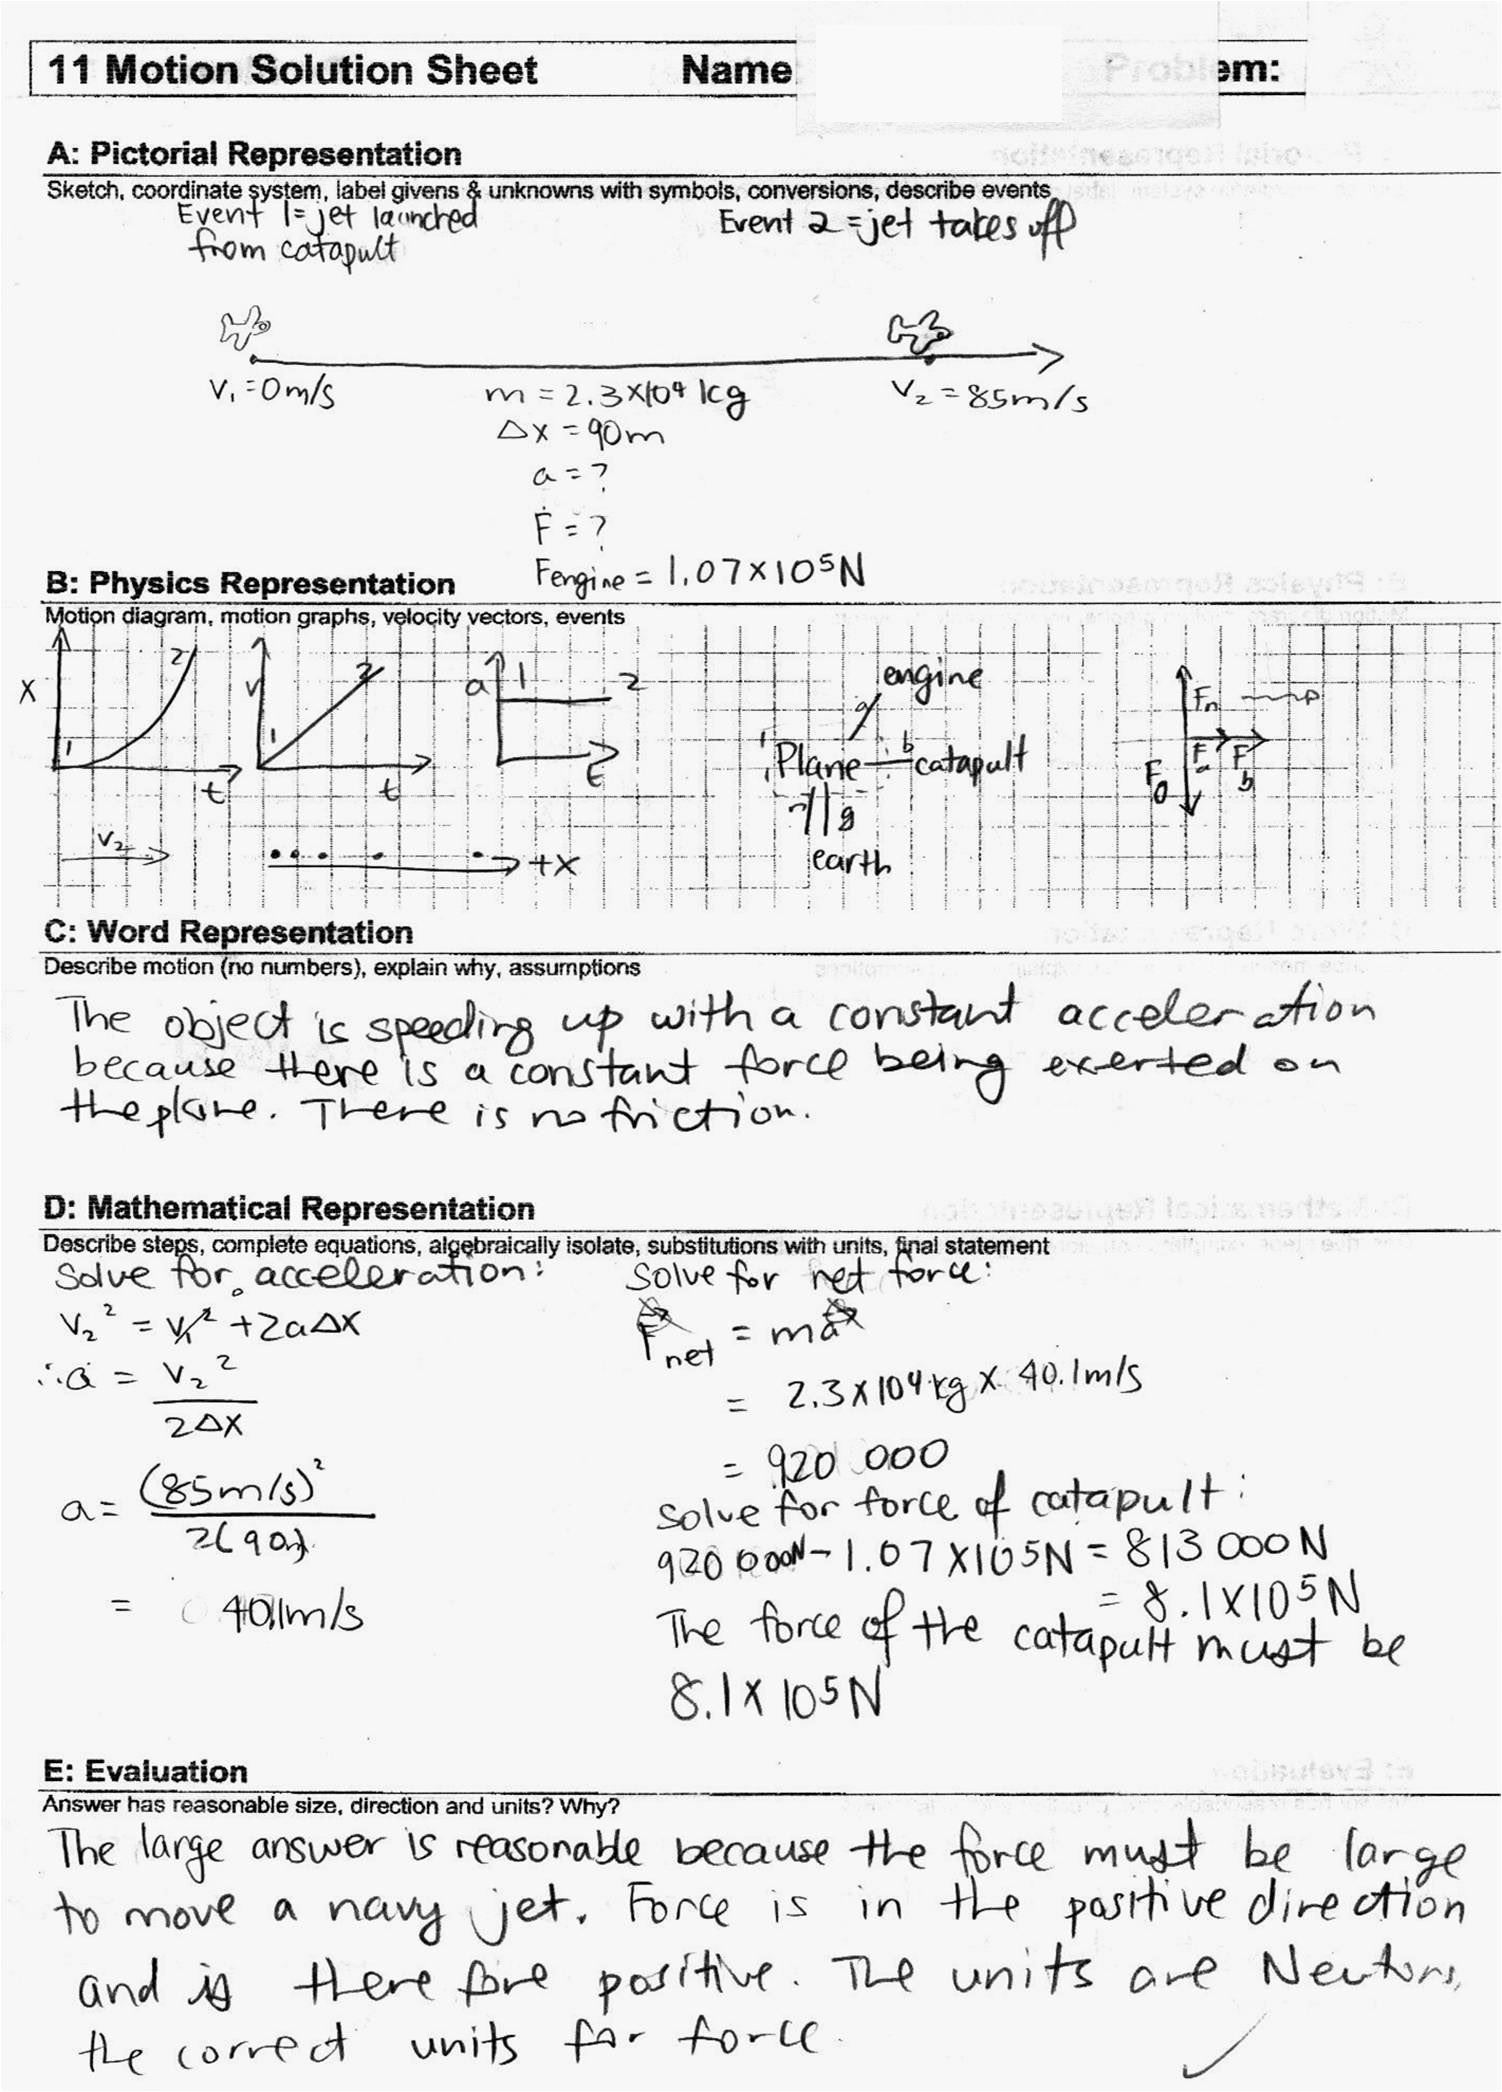 Physics math symbols brinks safe 5059 saudi arabia flag vector per corner fixing the gender imbalance in physics per corner math work per fixing the gender imbalance in physicshtml physics math symbols buycottarizona